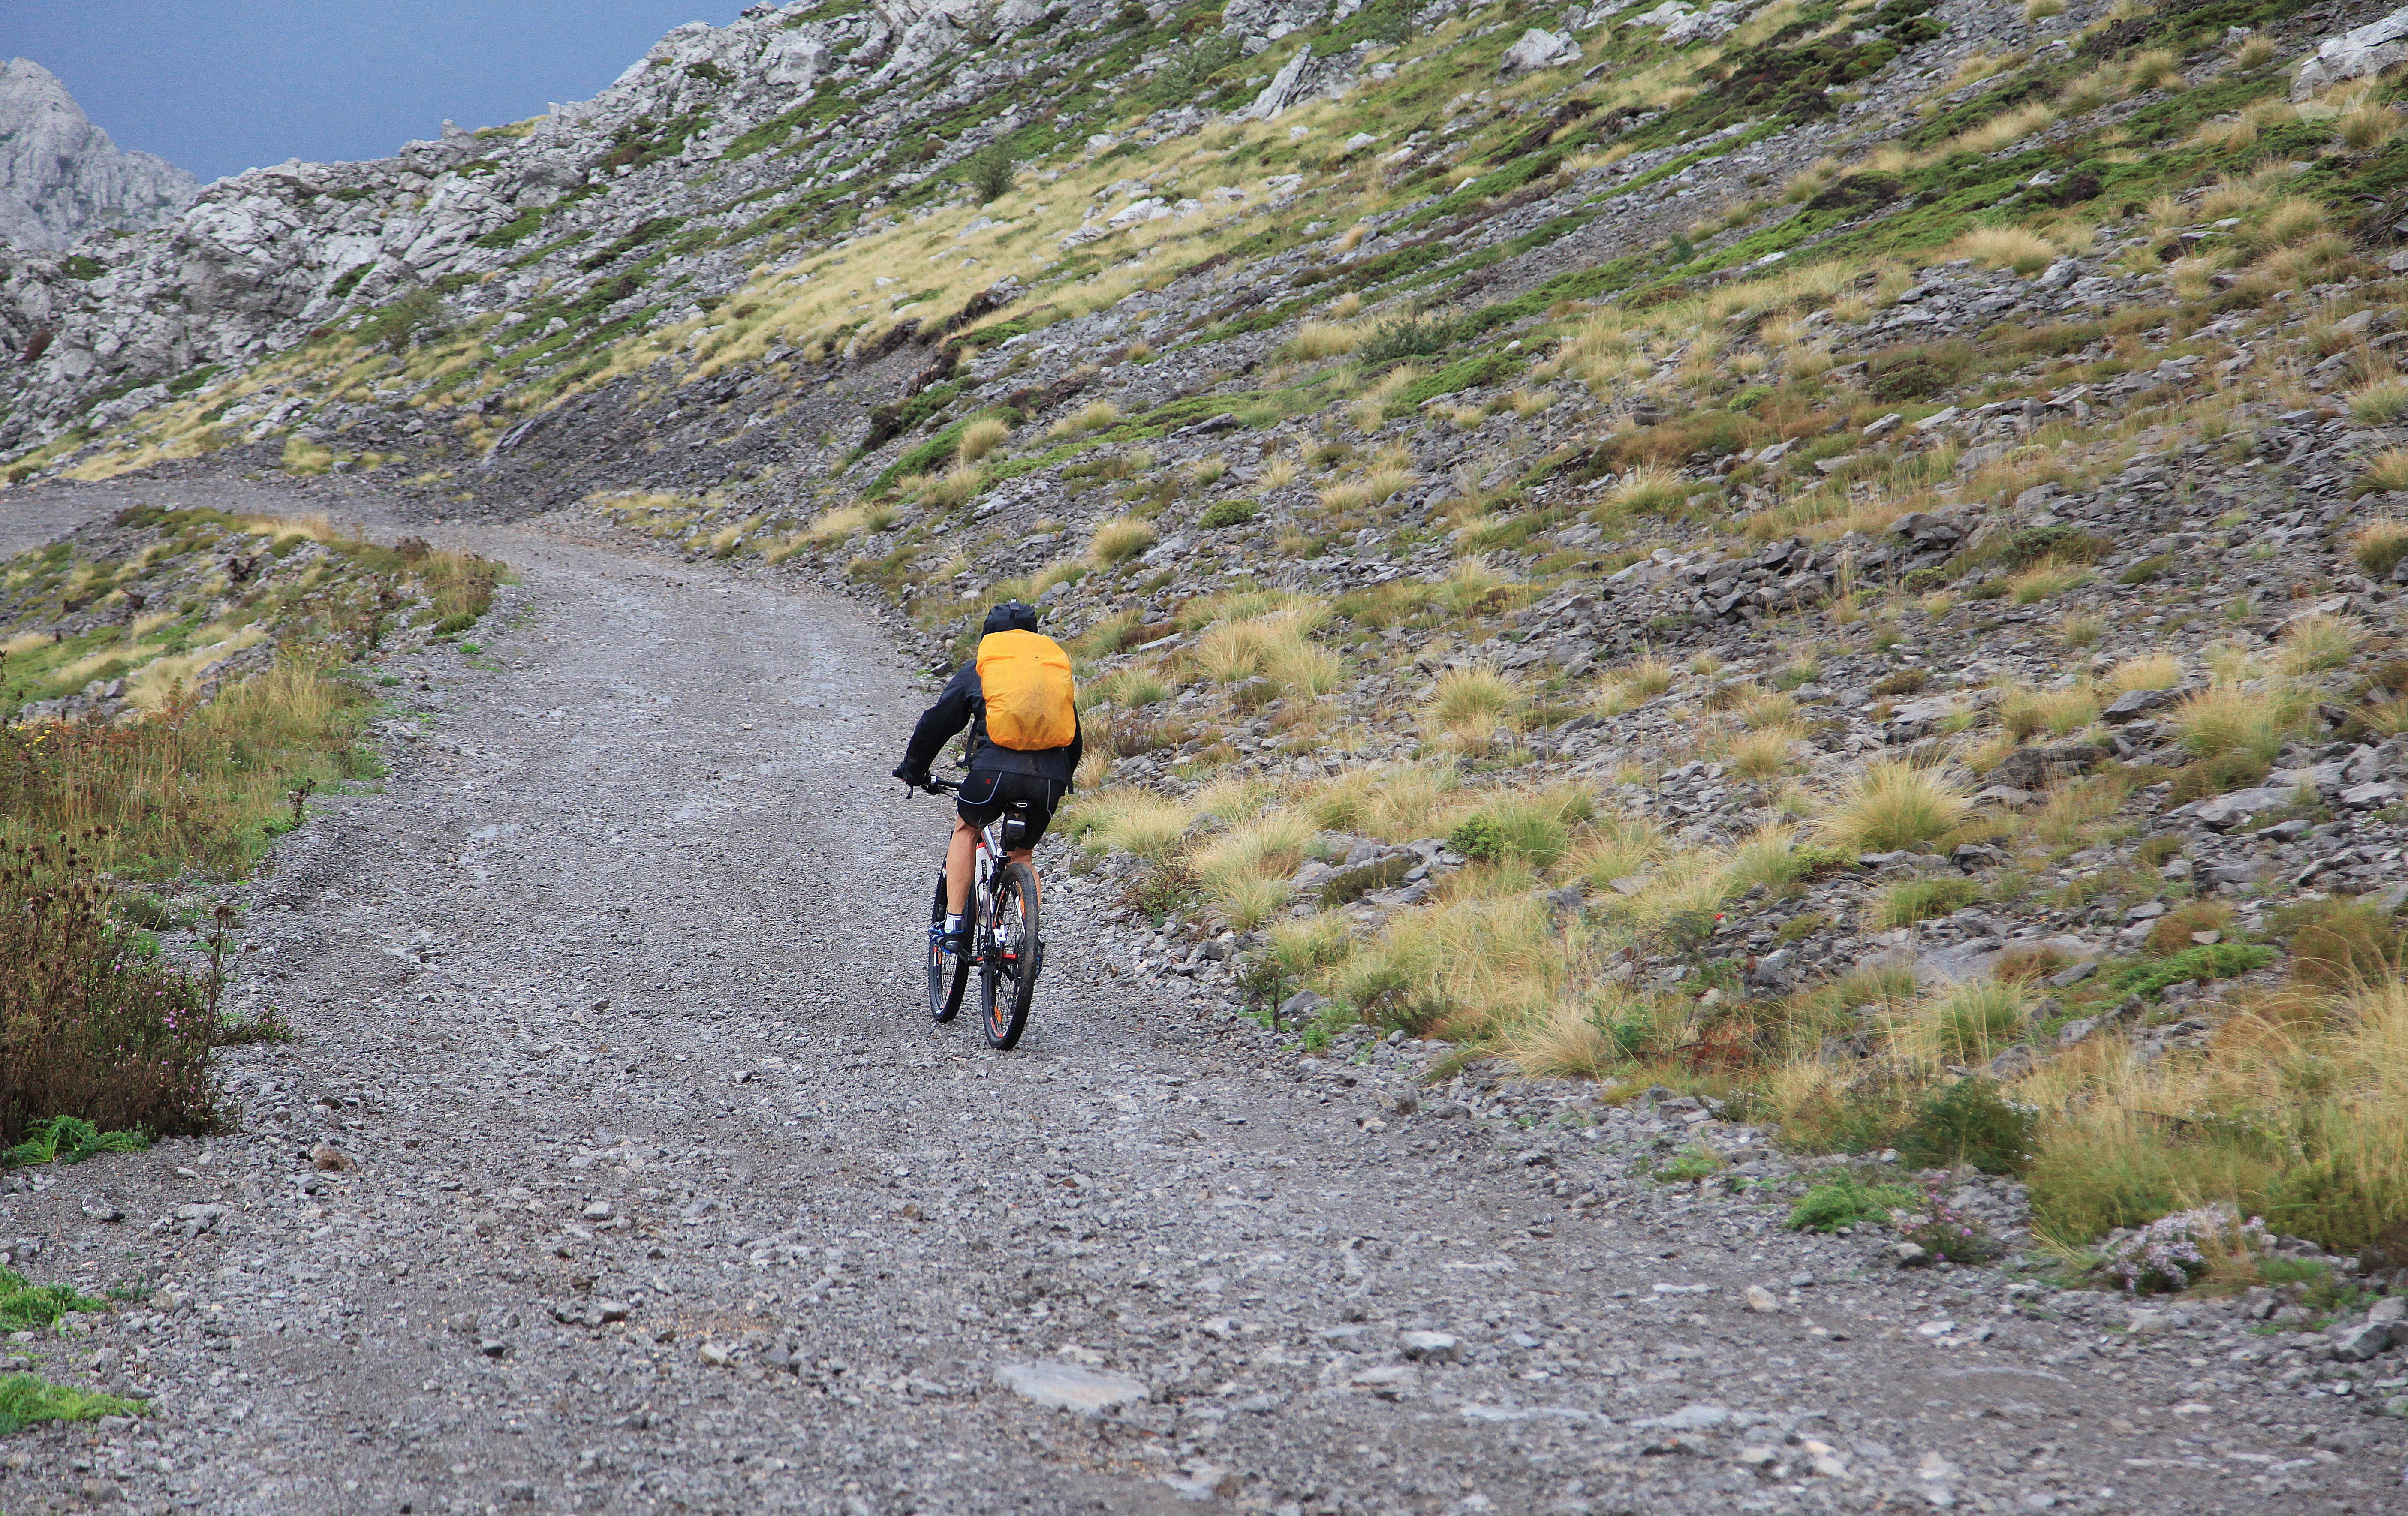 Take a bike and explore Paklenica national park!